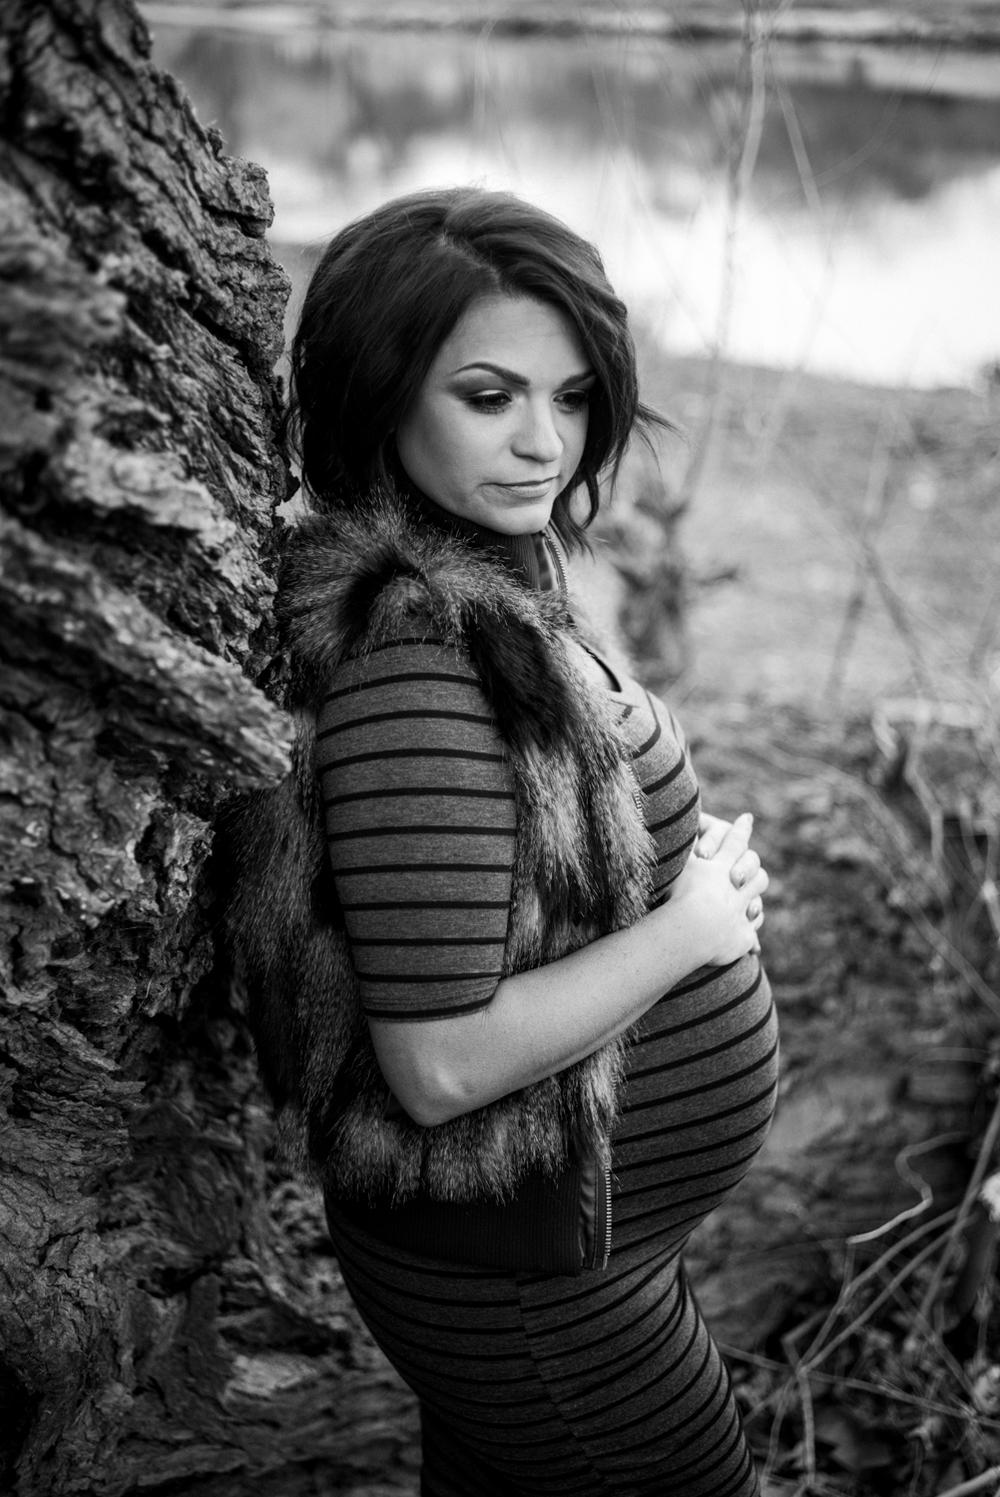 Wichita, Kansas Maternity Photographer - Neal Dieker - Wichita, Kansas Portrait Photographer-114.jpg